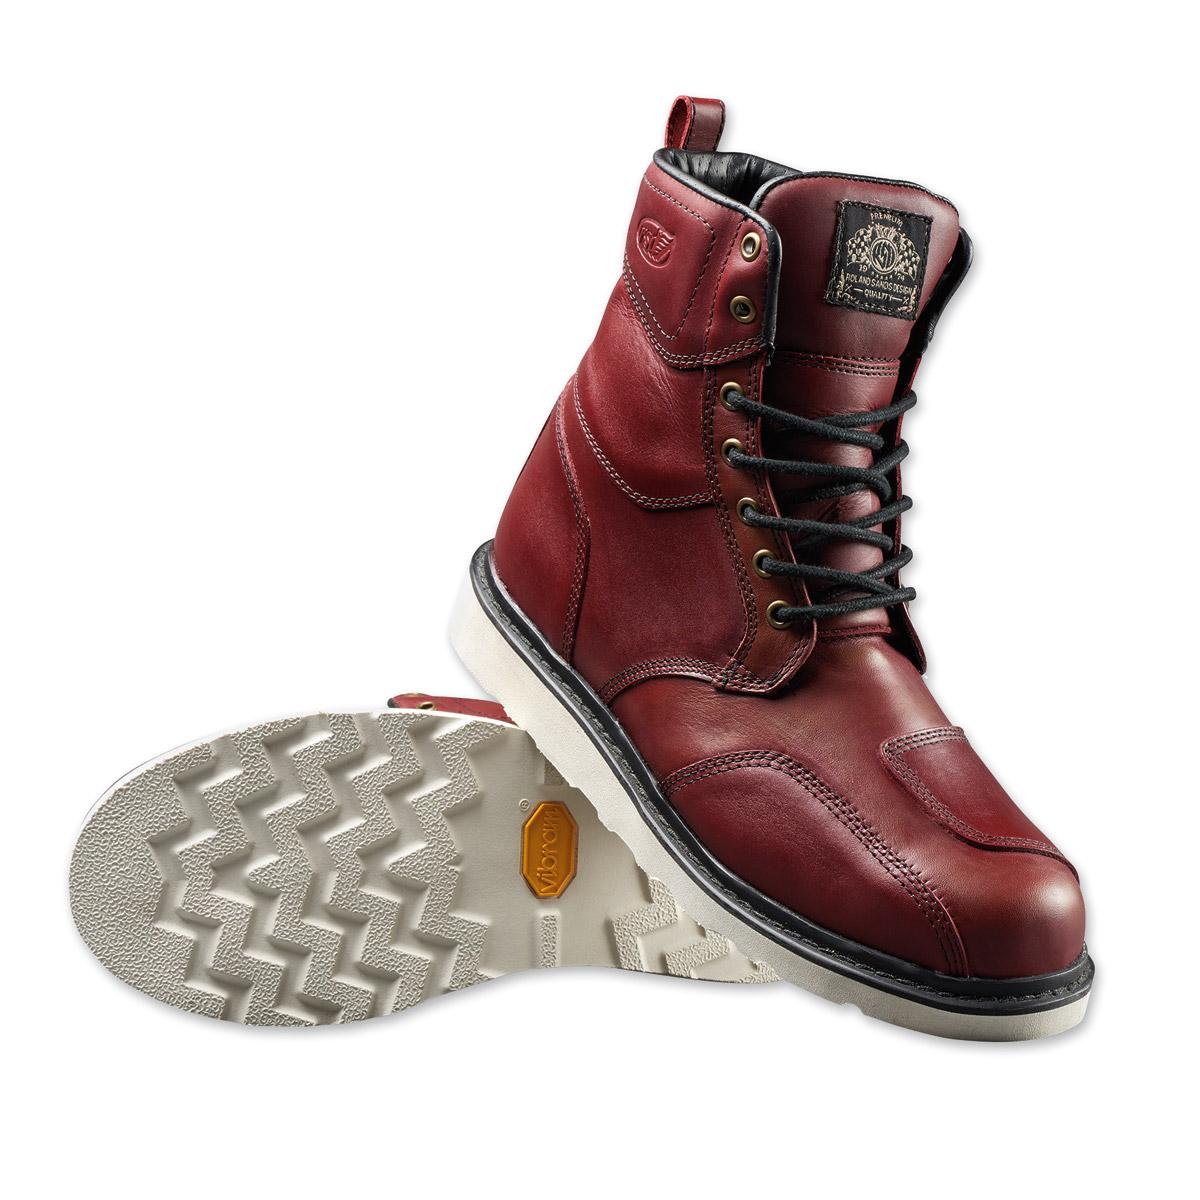 04ec14b304889 Roland Sands Design Men's Mojave Oxblood Leather Boots - 0810-0301-3563